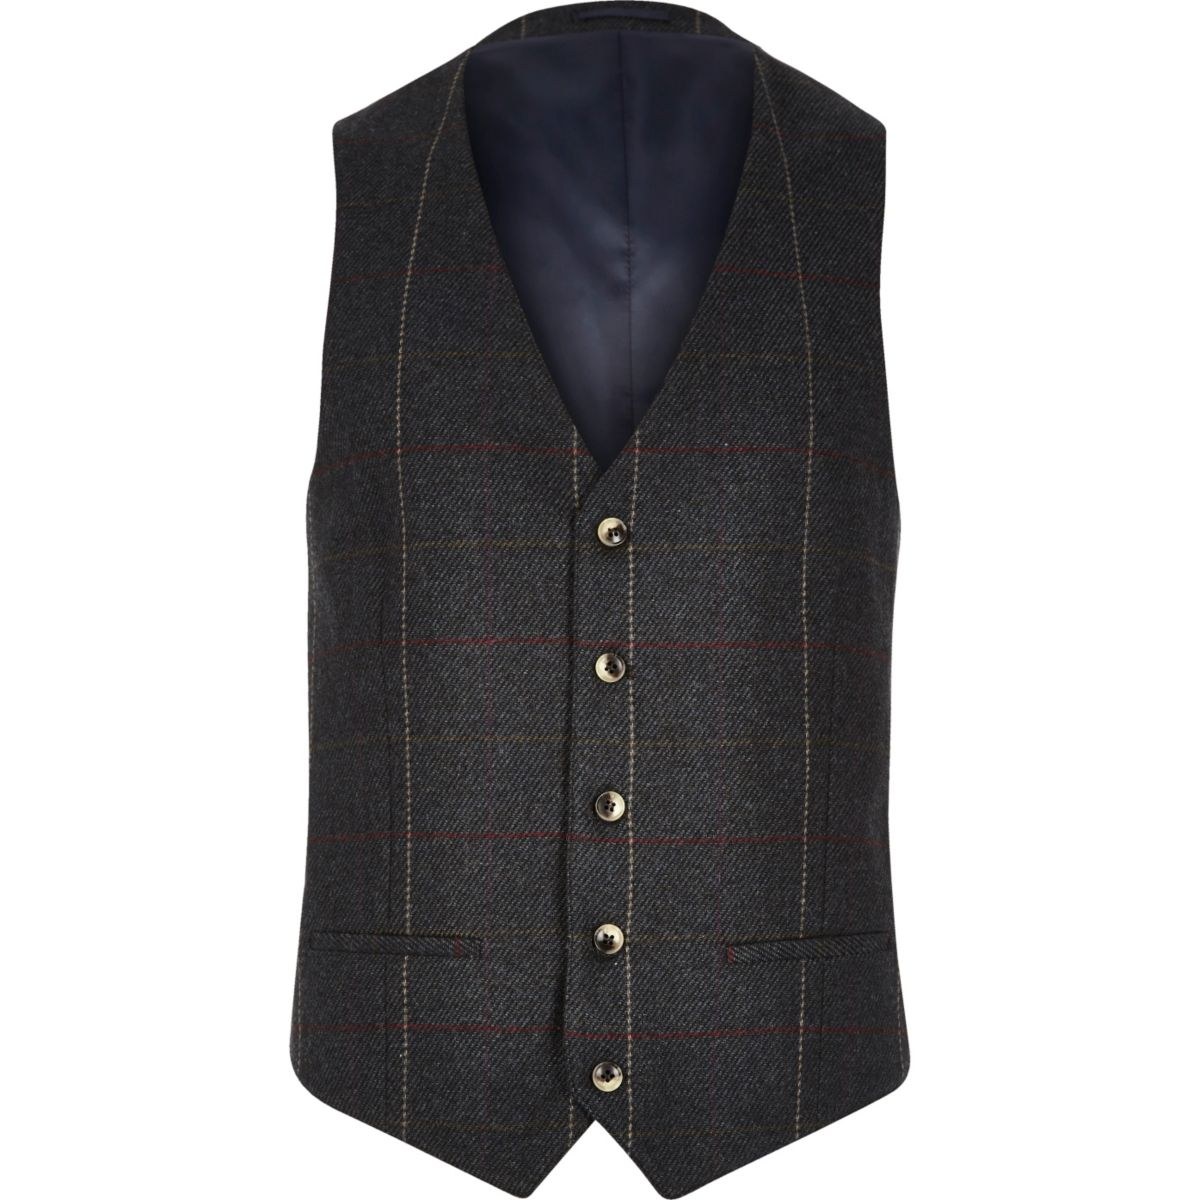 Dark green check vest